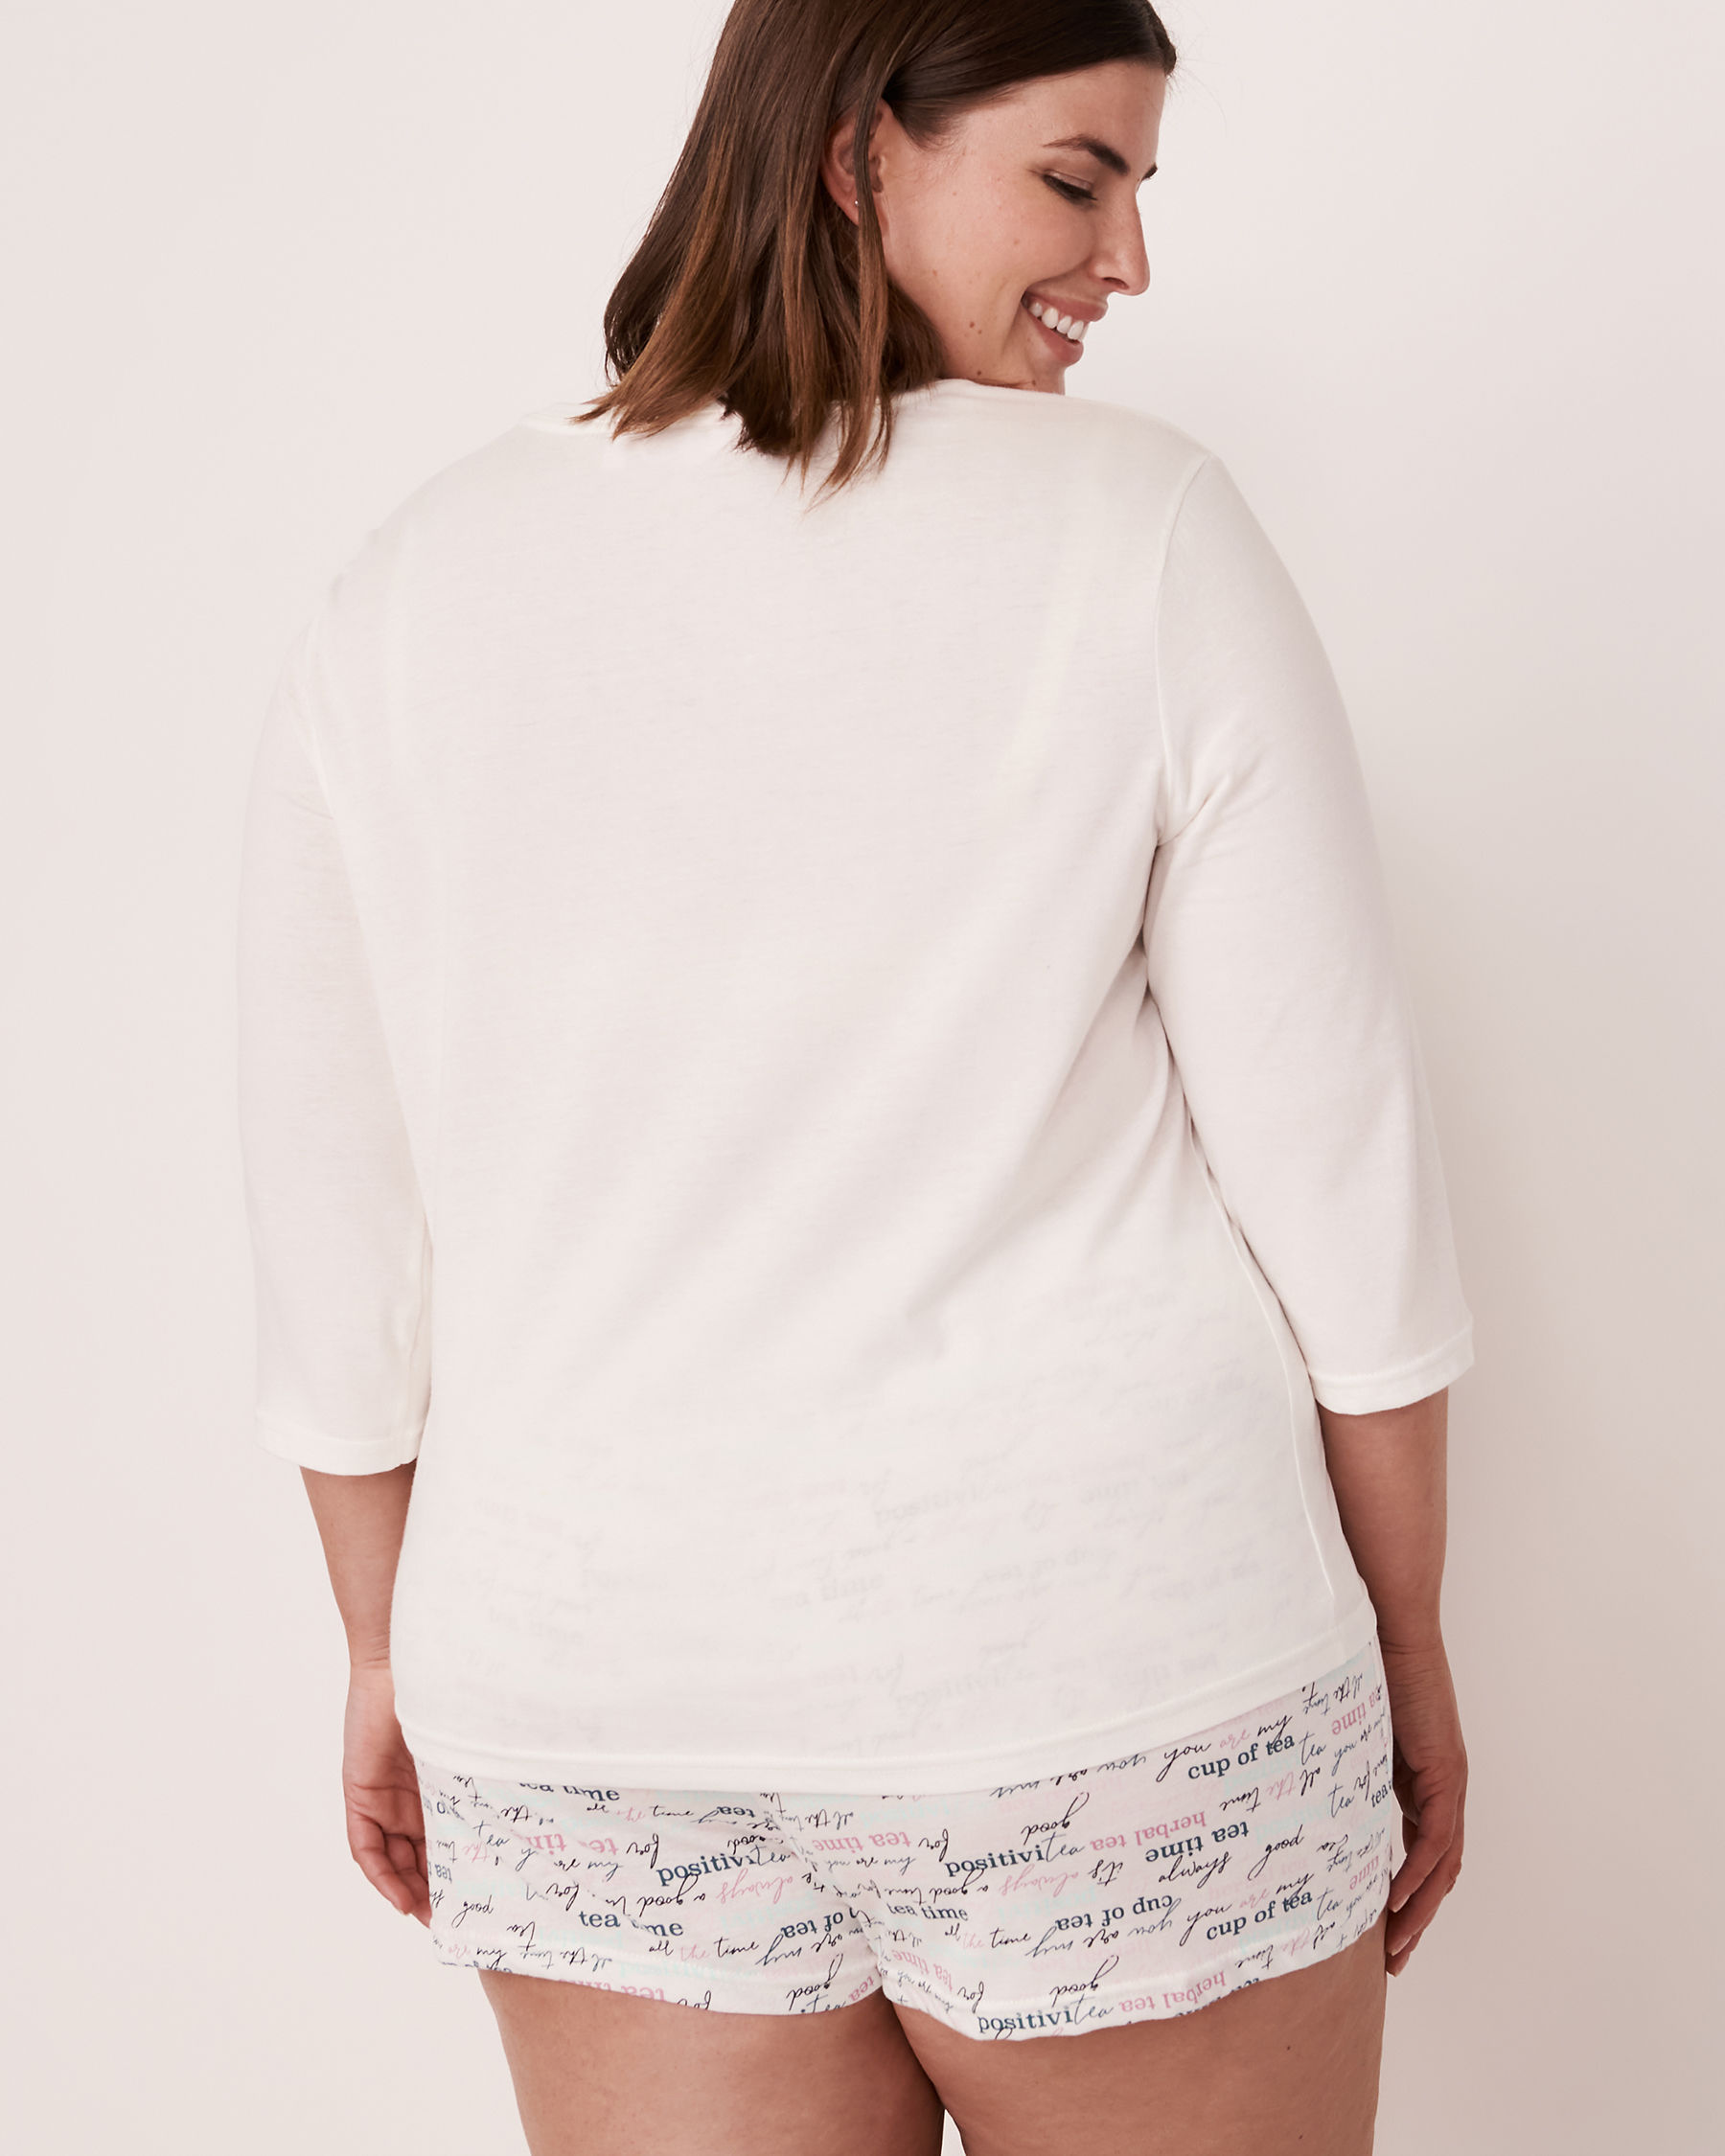 LA VIE EN ROSE V-neckline 3/4 Sleeve Shirt White 40100179 - View6